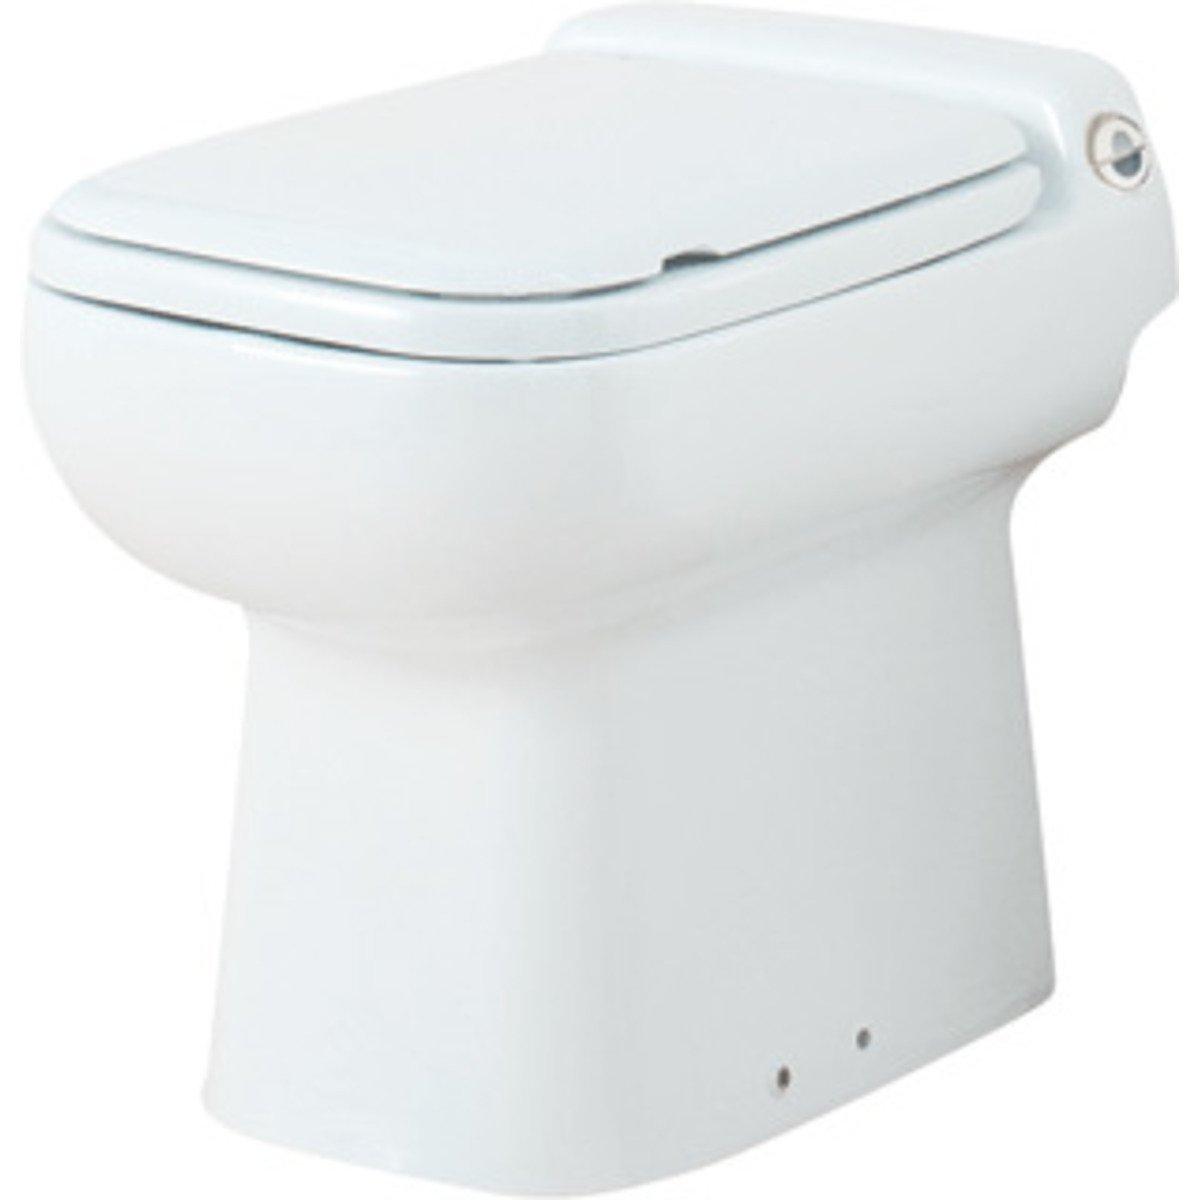 Sanibroyeur Sanicompact Luxe Broyeur Sanitaire Encastrable pour Toilettes Broyeur